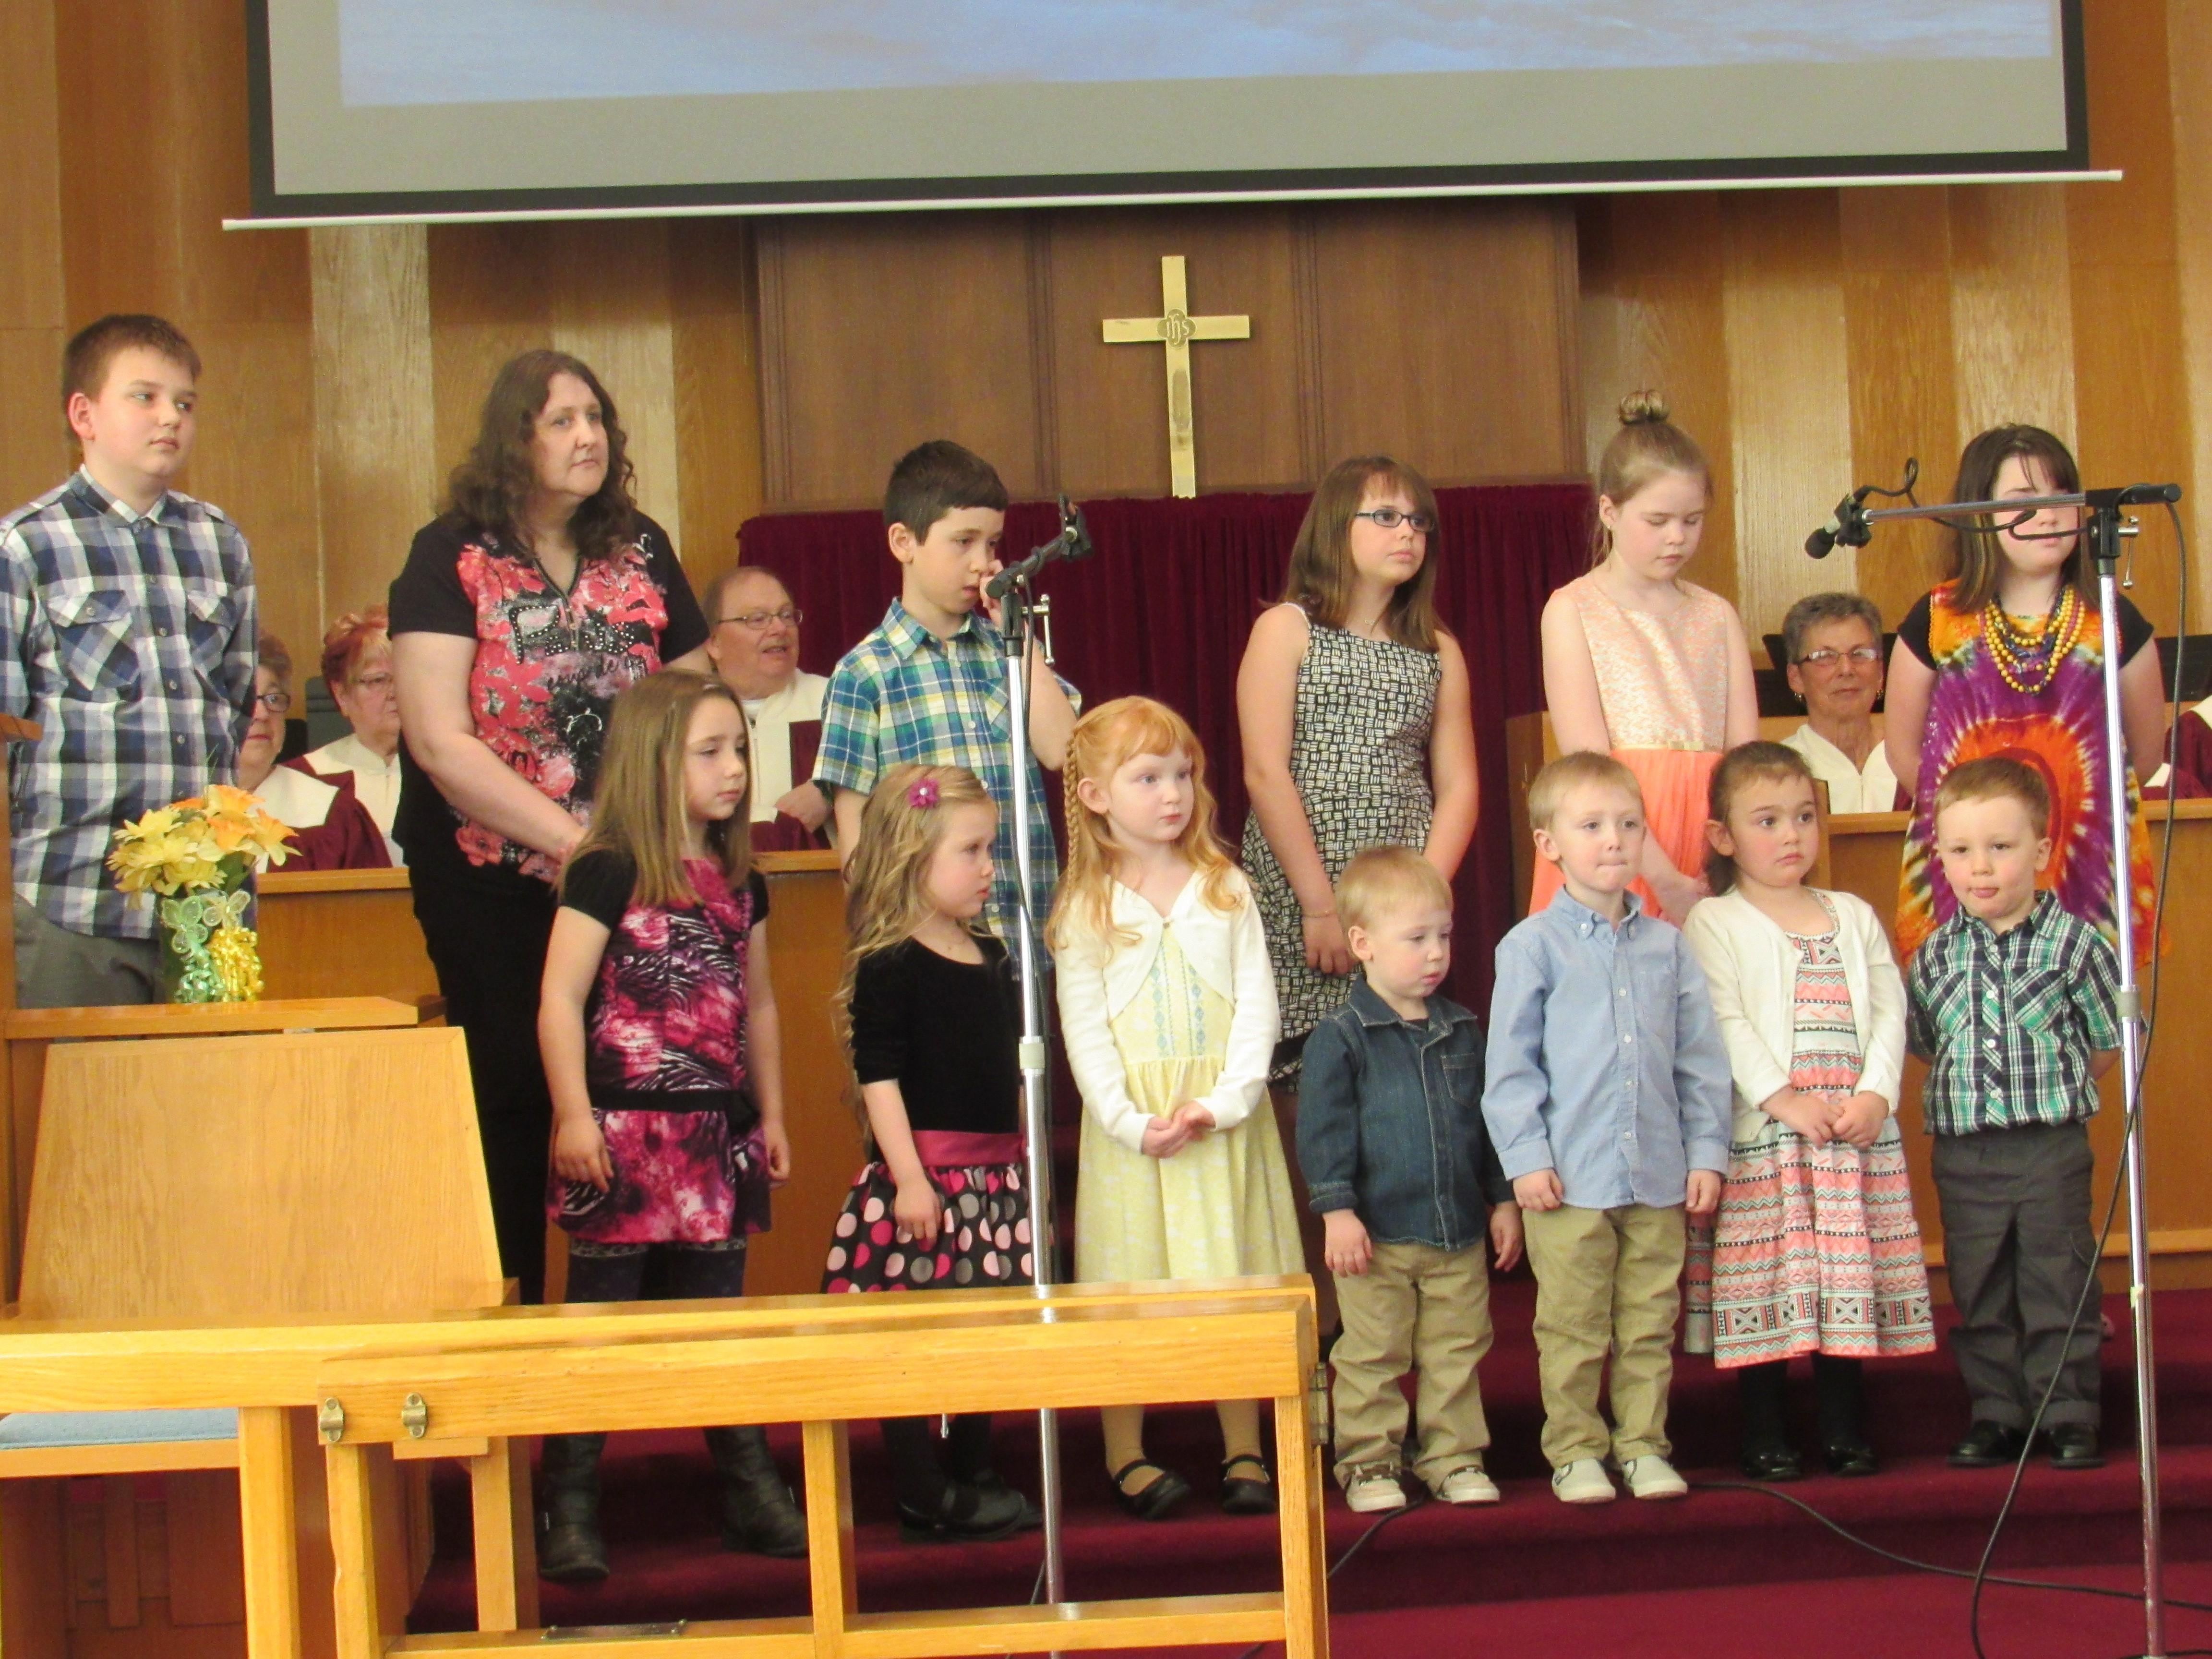 Family Christian Sunday 2017